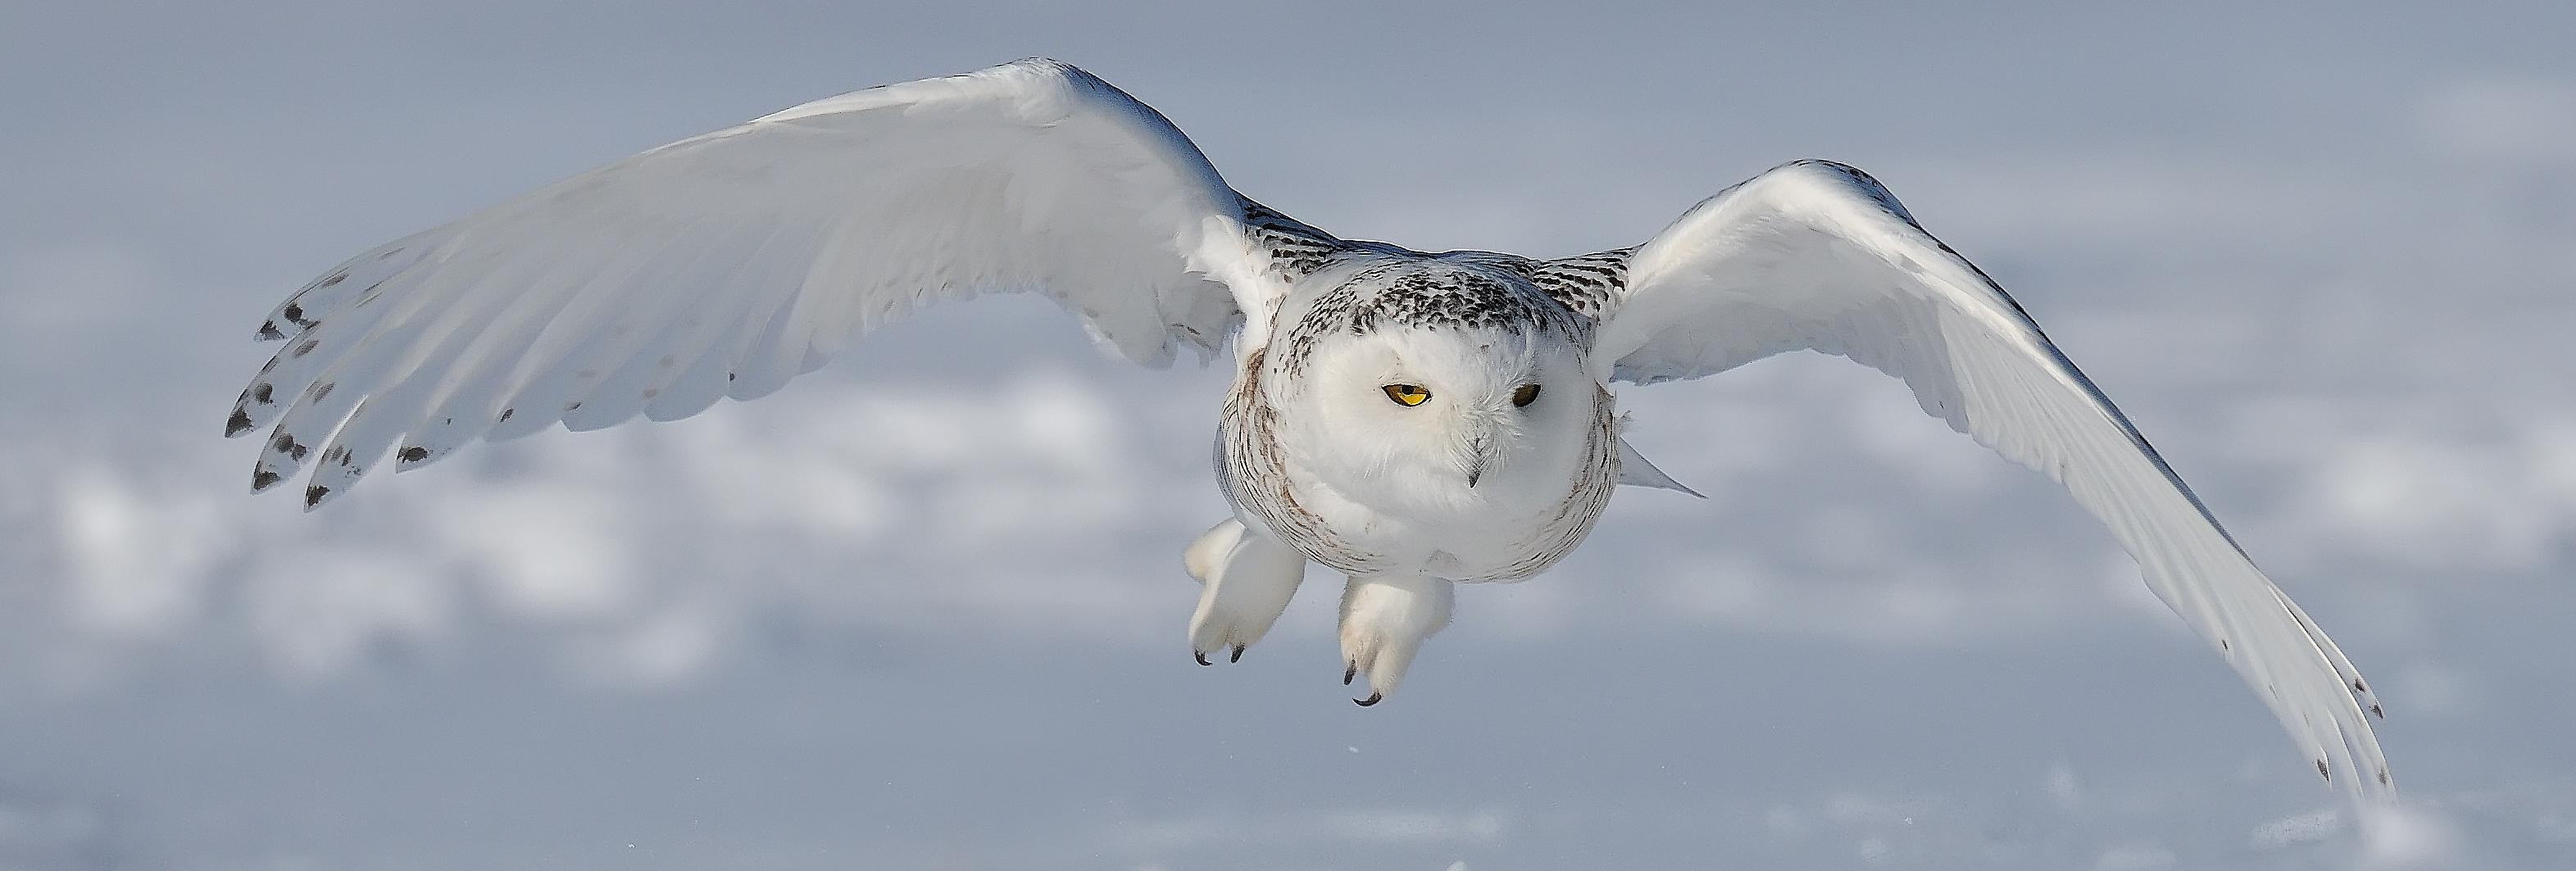 Snowy-Owl cropped